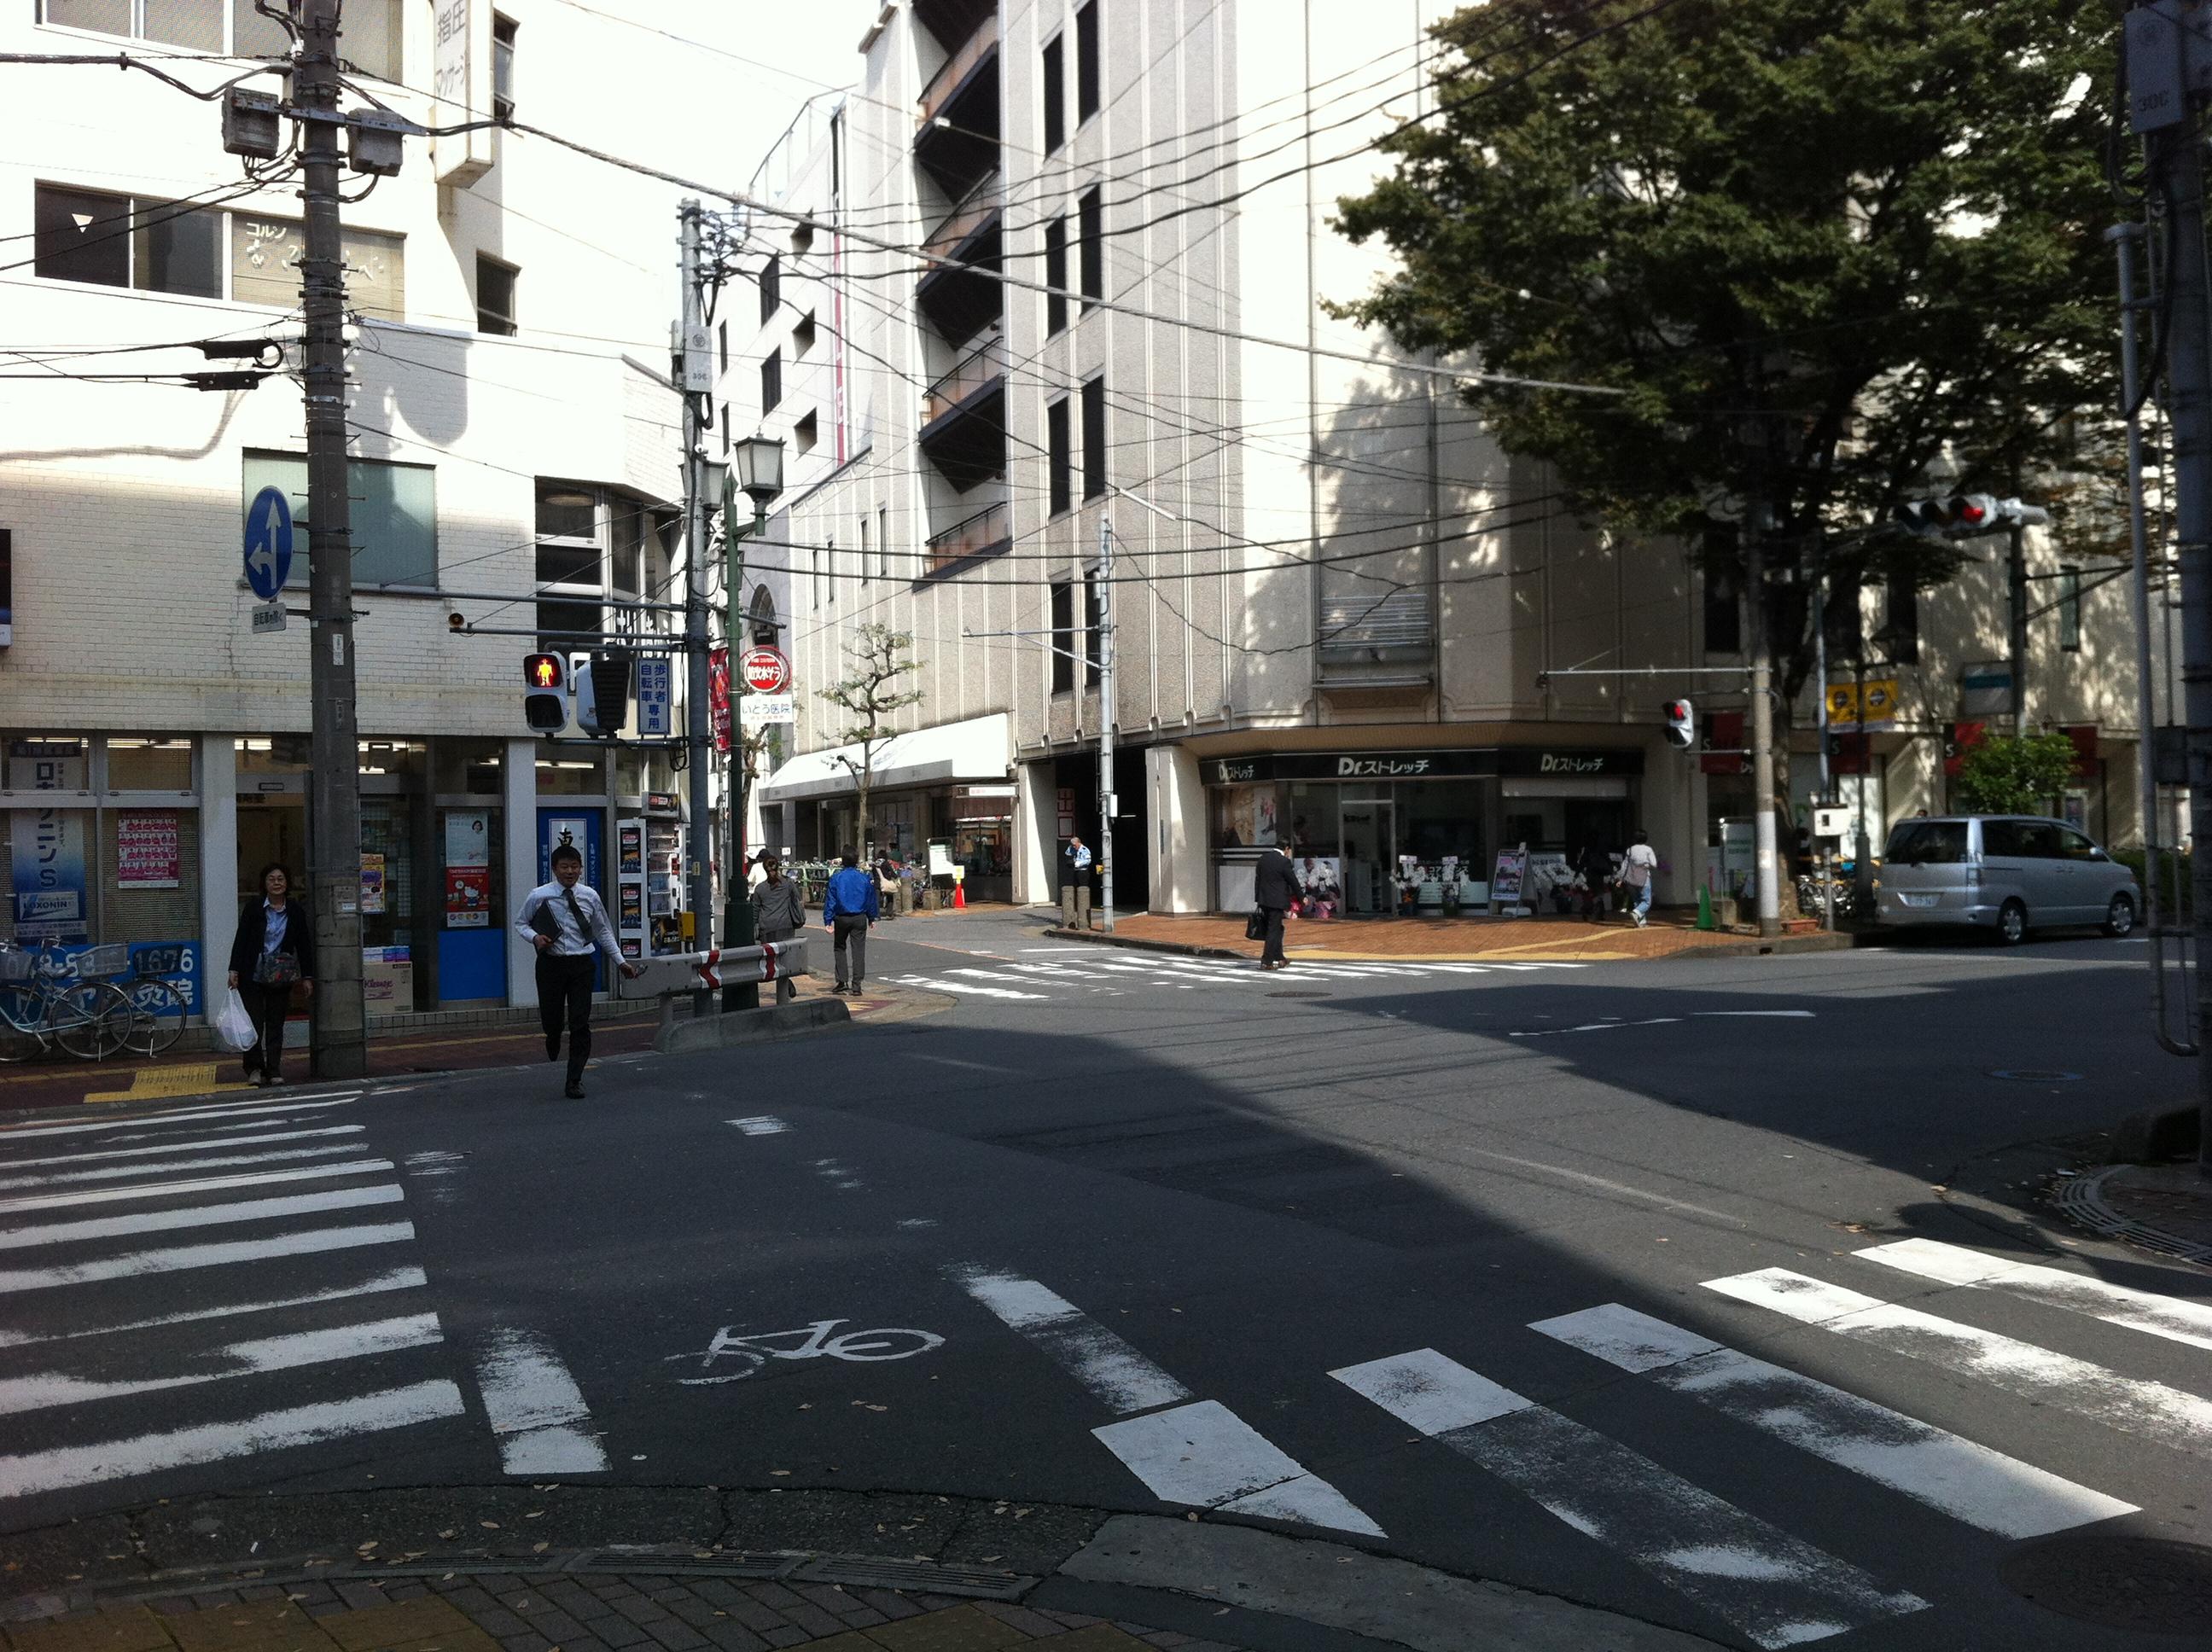 http://www.washin-optical.co.jp/blog/kenchodori/IMG_1154.JPG